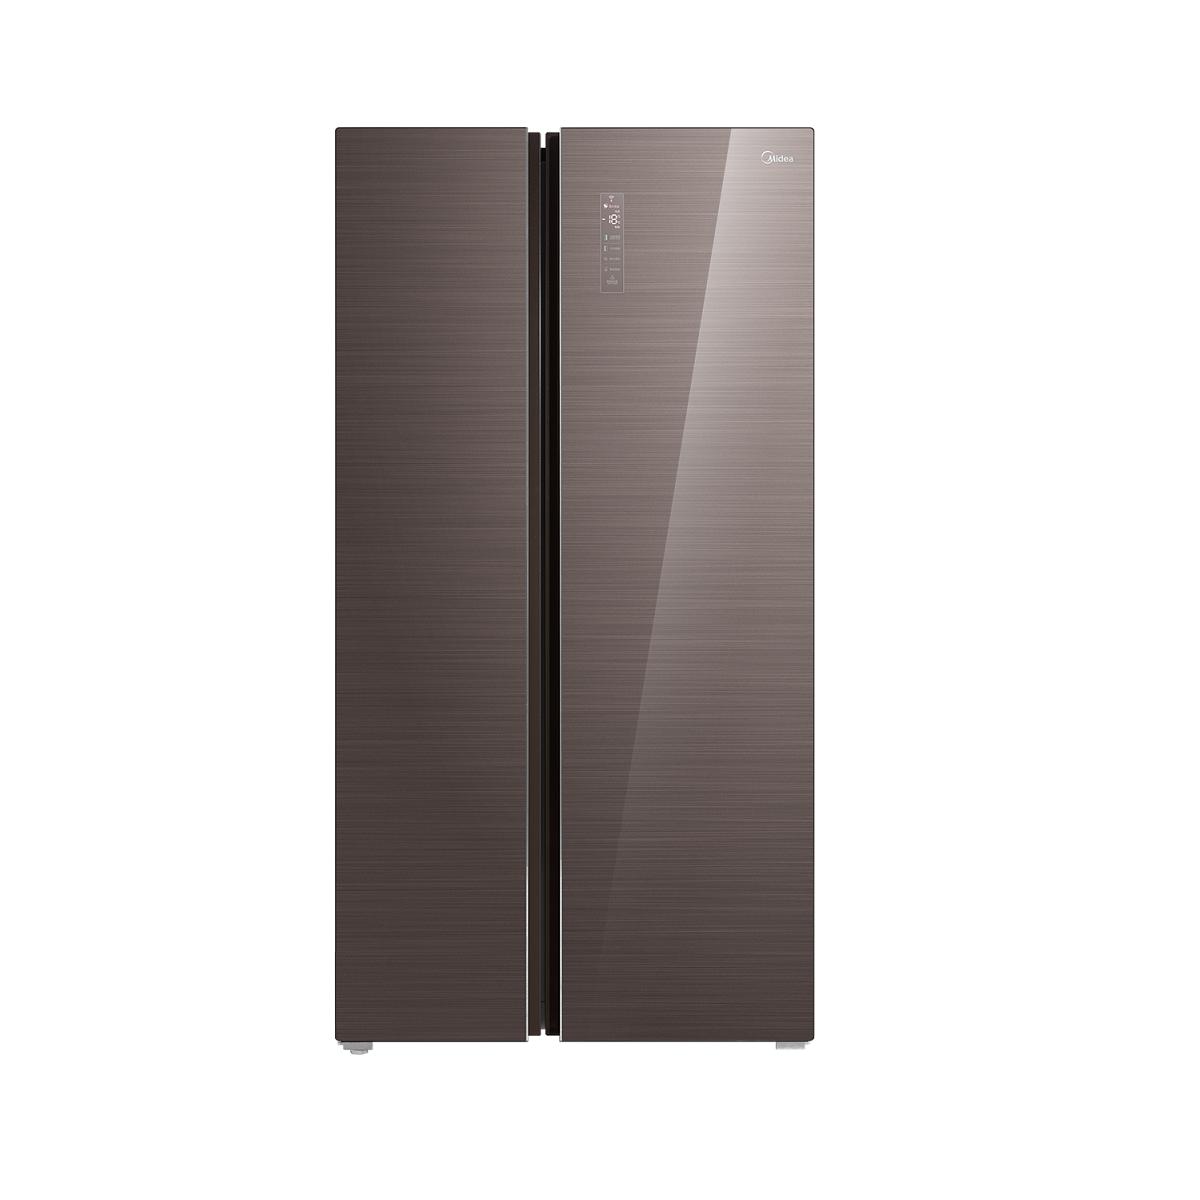 Midea/美的 BCD-609WKGPZM(E)冰箱 说明书.pdf